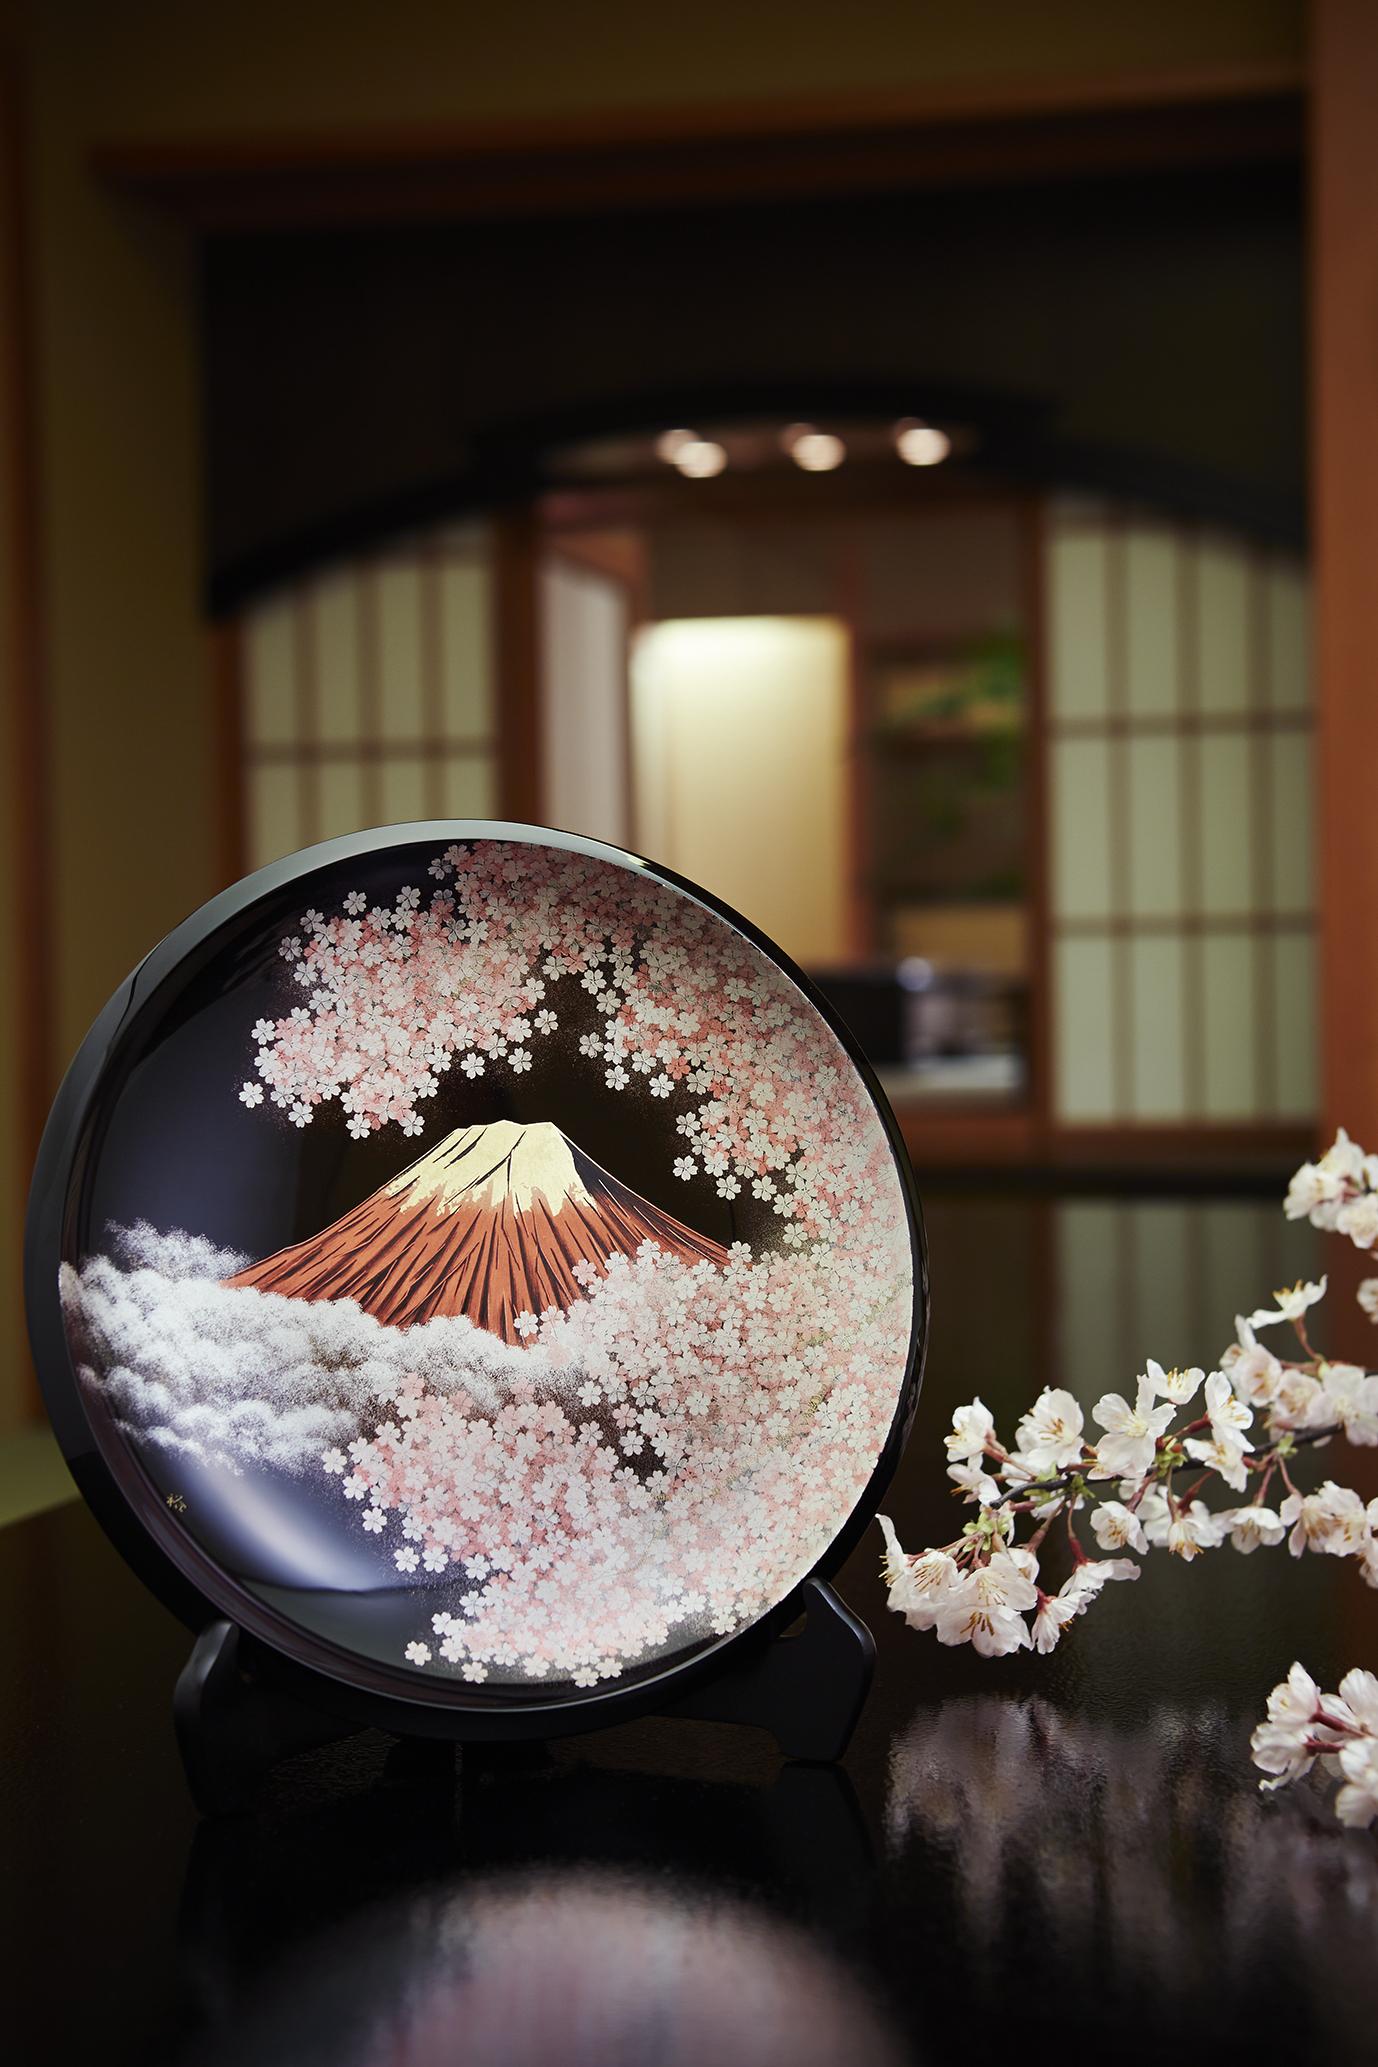 keio plaza hotel tokyo holds experience mt fuji and cherry blossom